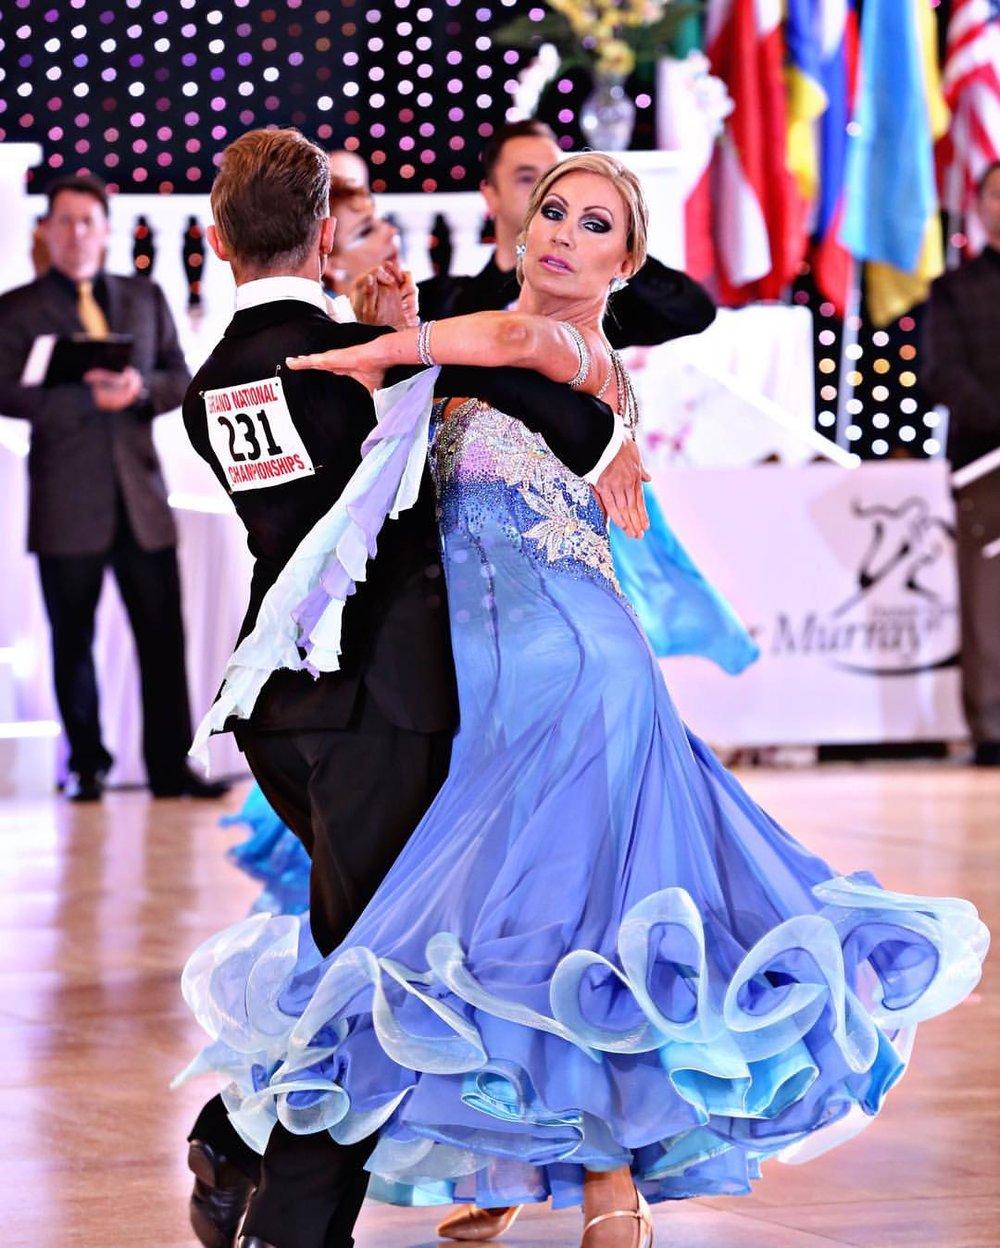 Ballroom Dance Lessons | The First Dance | Wedding Choreography | Mayfair |London | PRO AM Ballroom Dancing with Marius Caluser